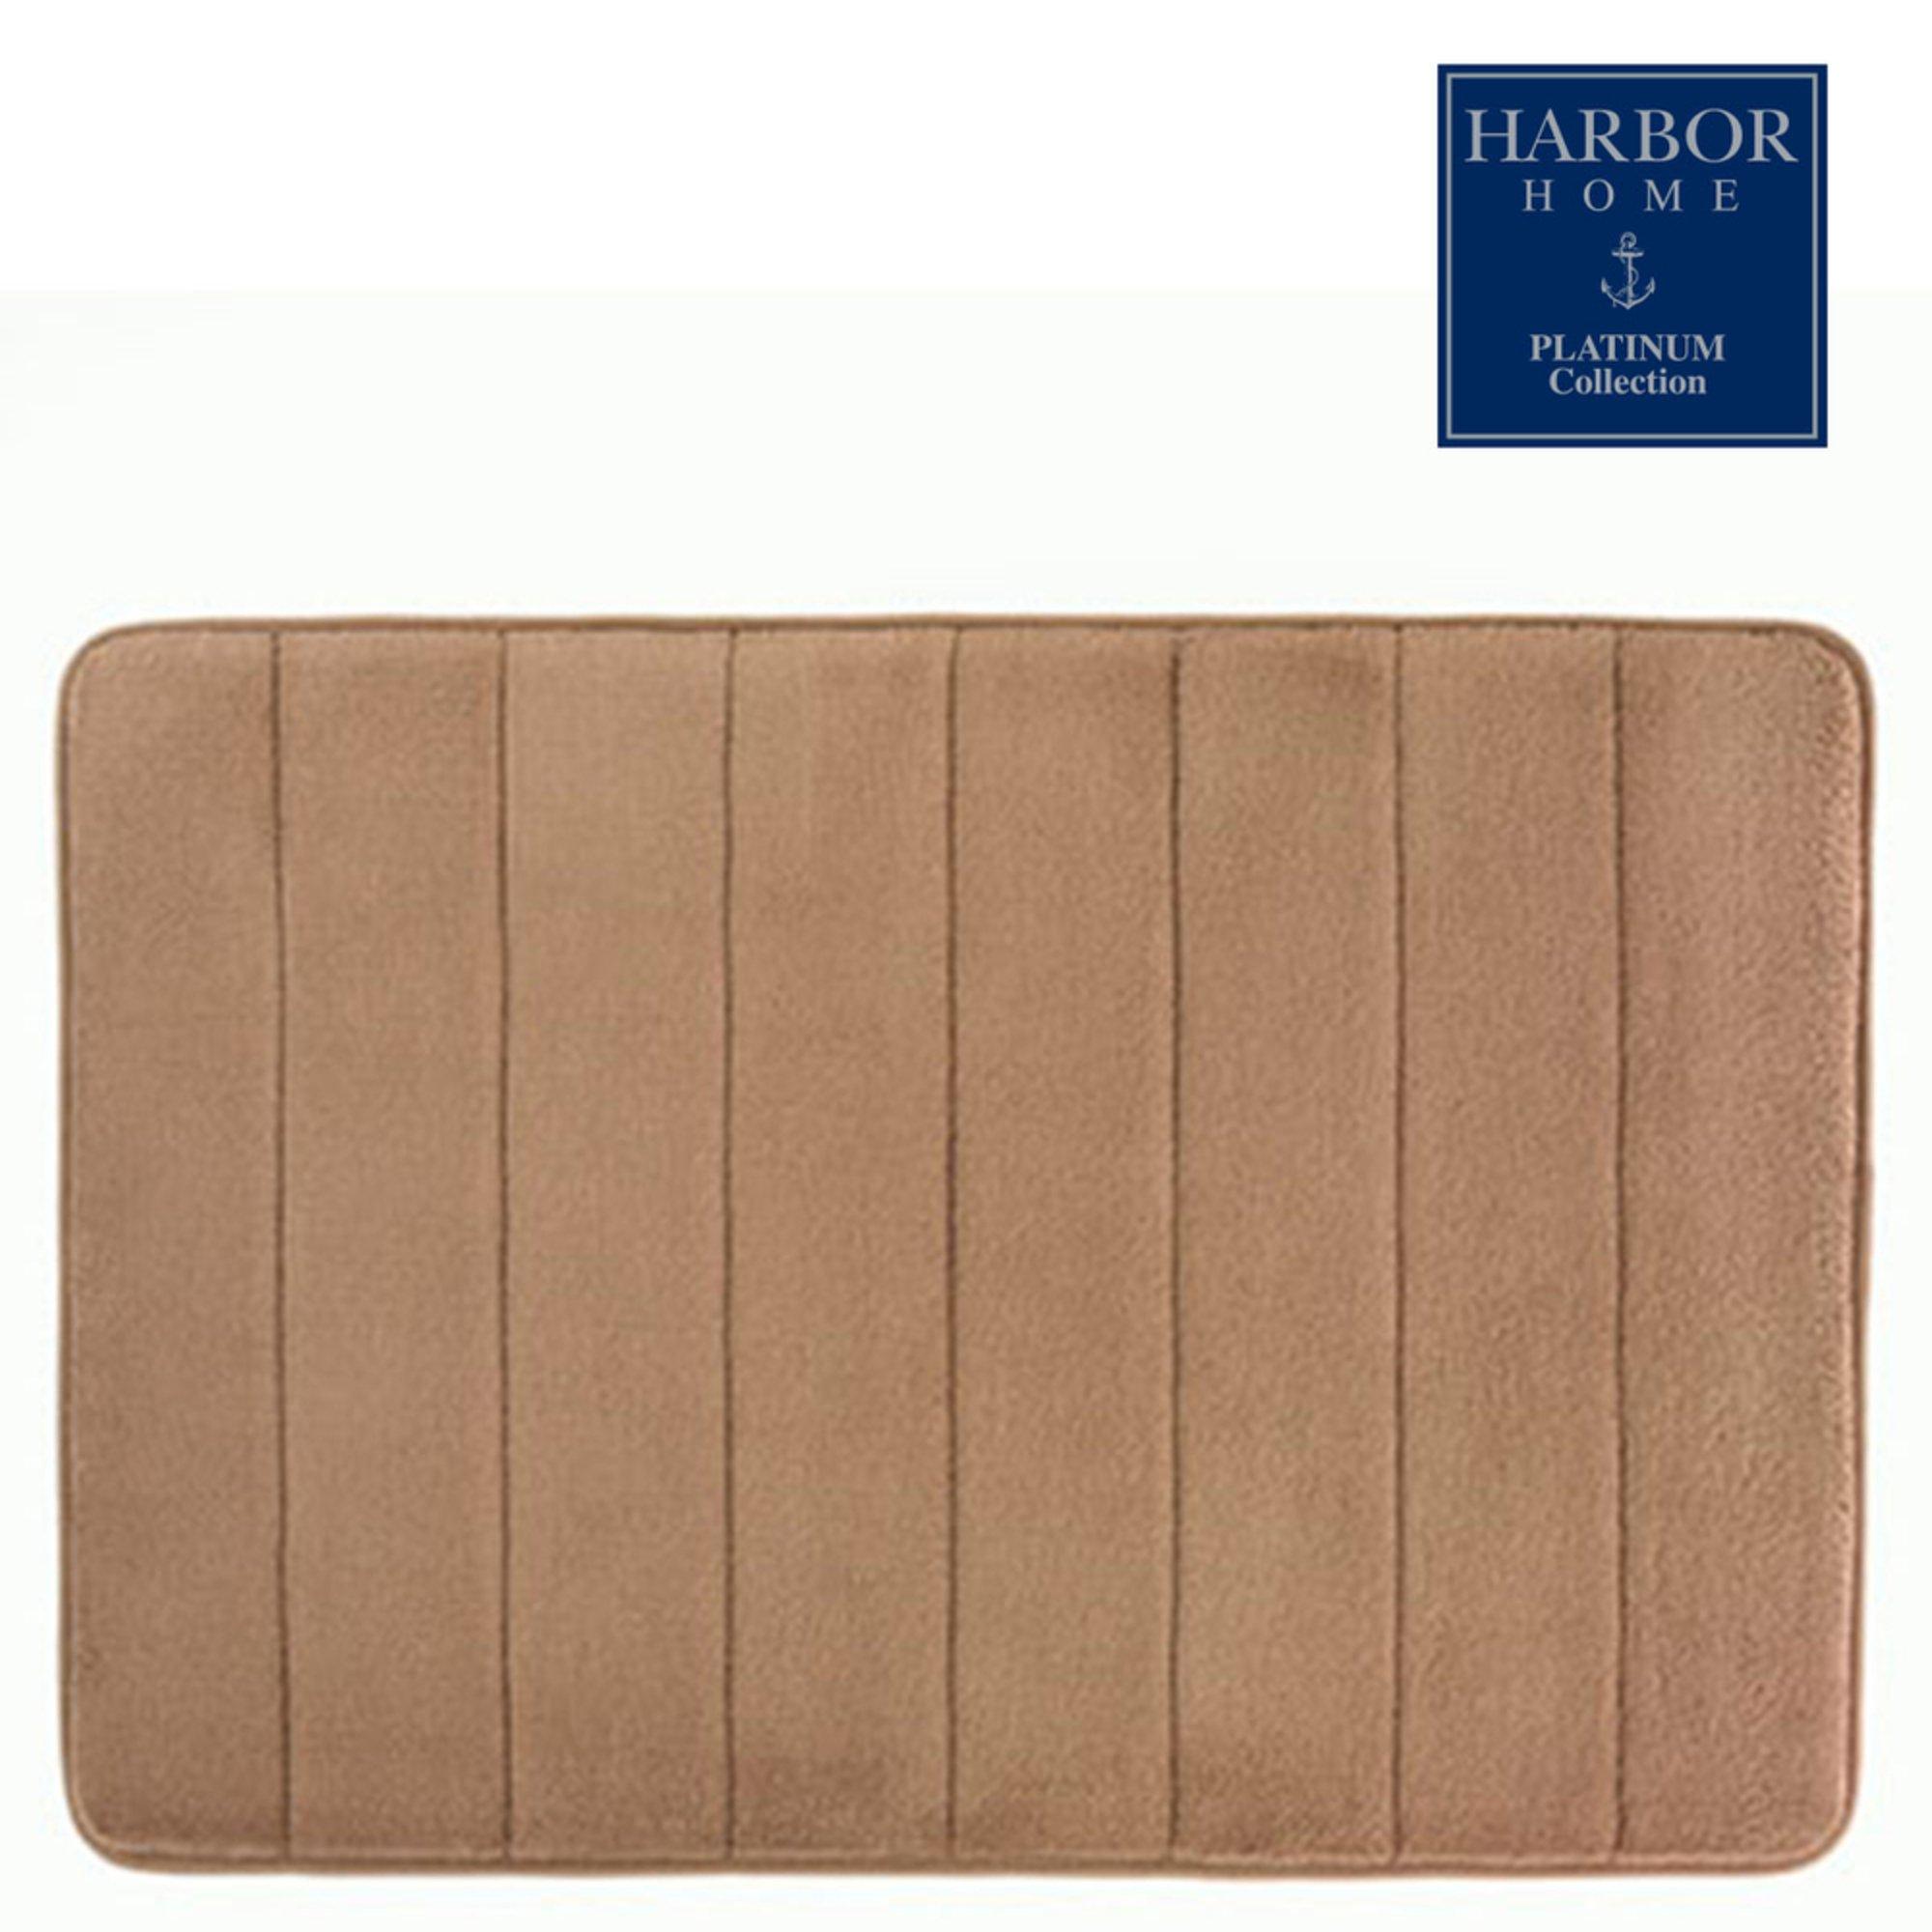 Brown and tan bath rugs rug designs - Designer bathroom rugs and mats ...